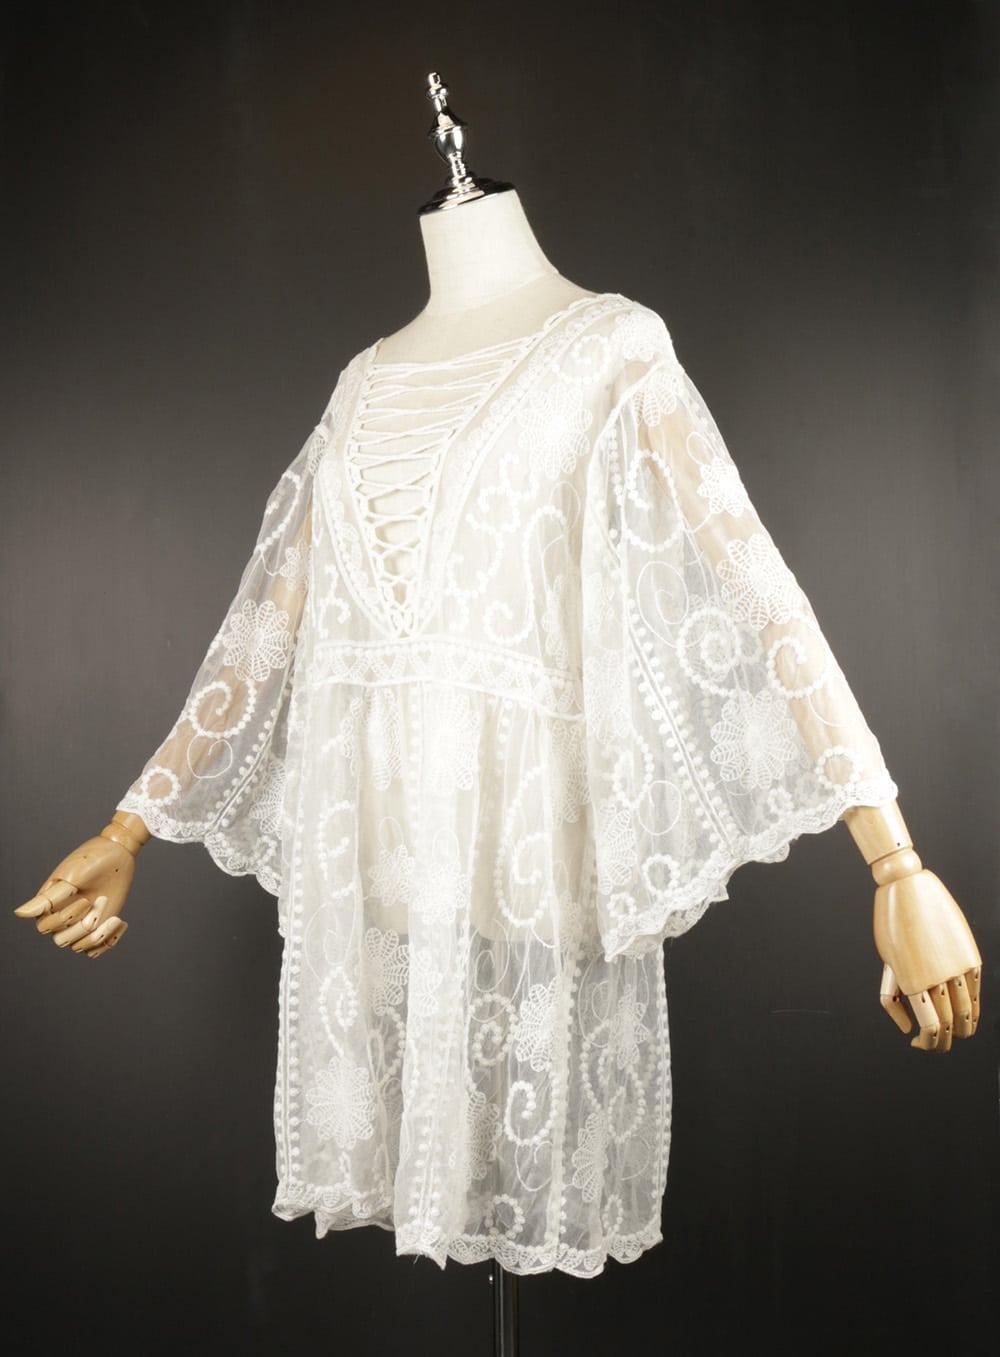 LSK0806 white Short lace kimono side